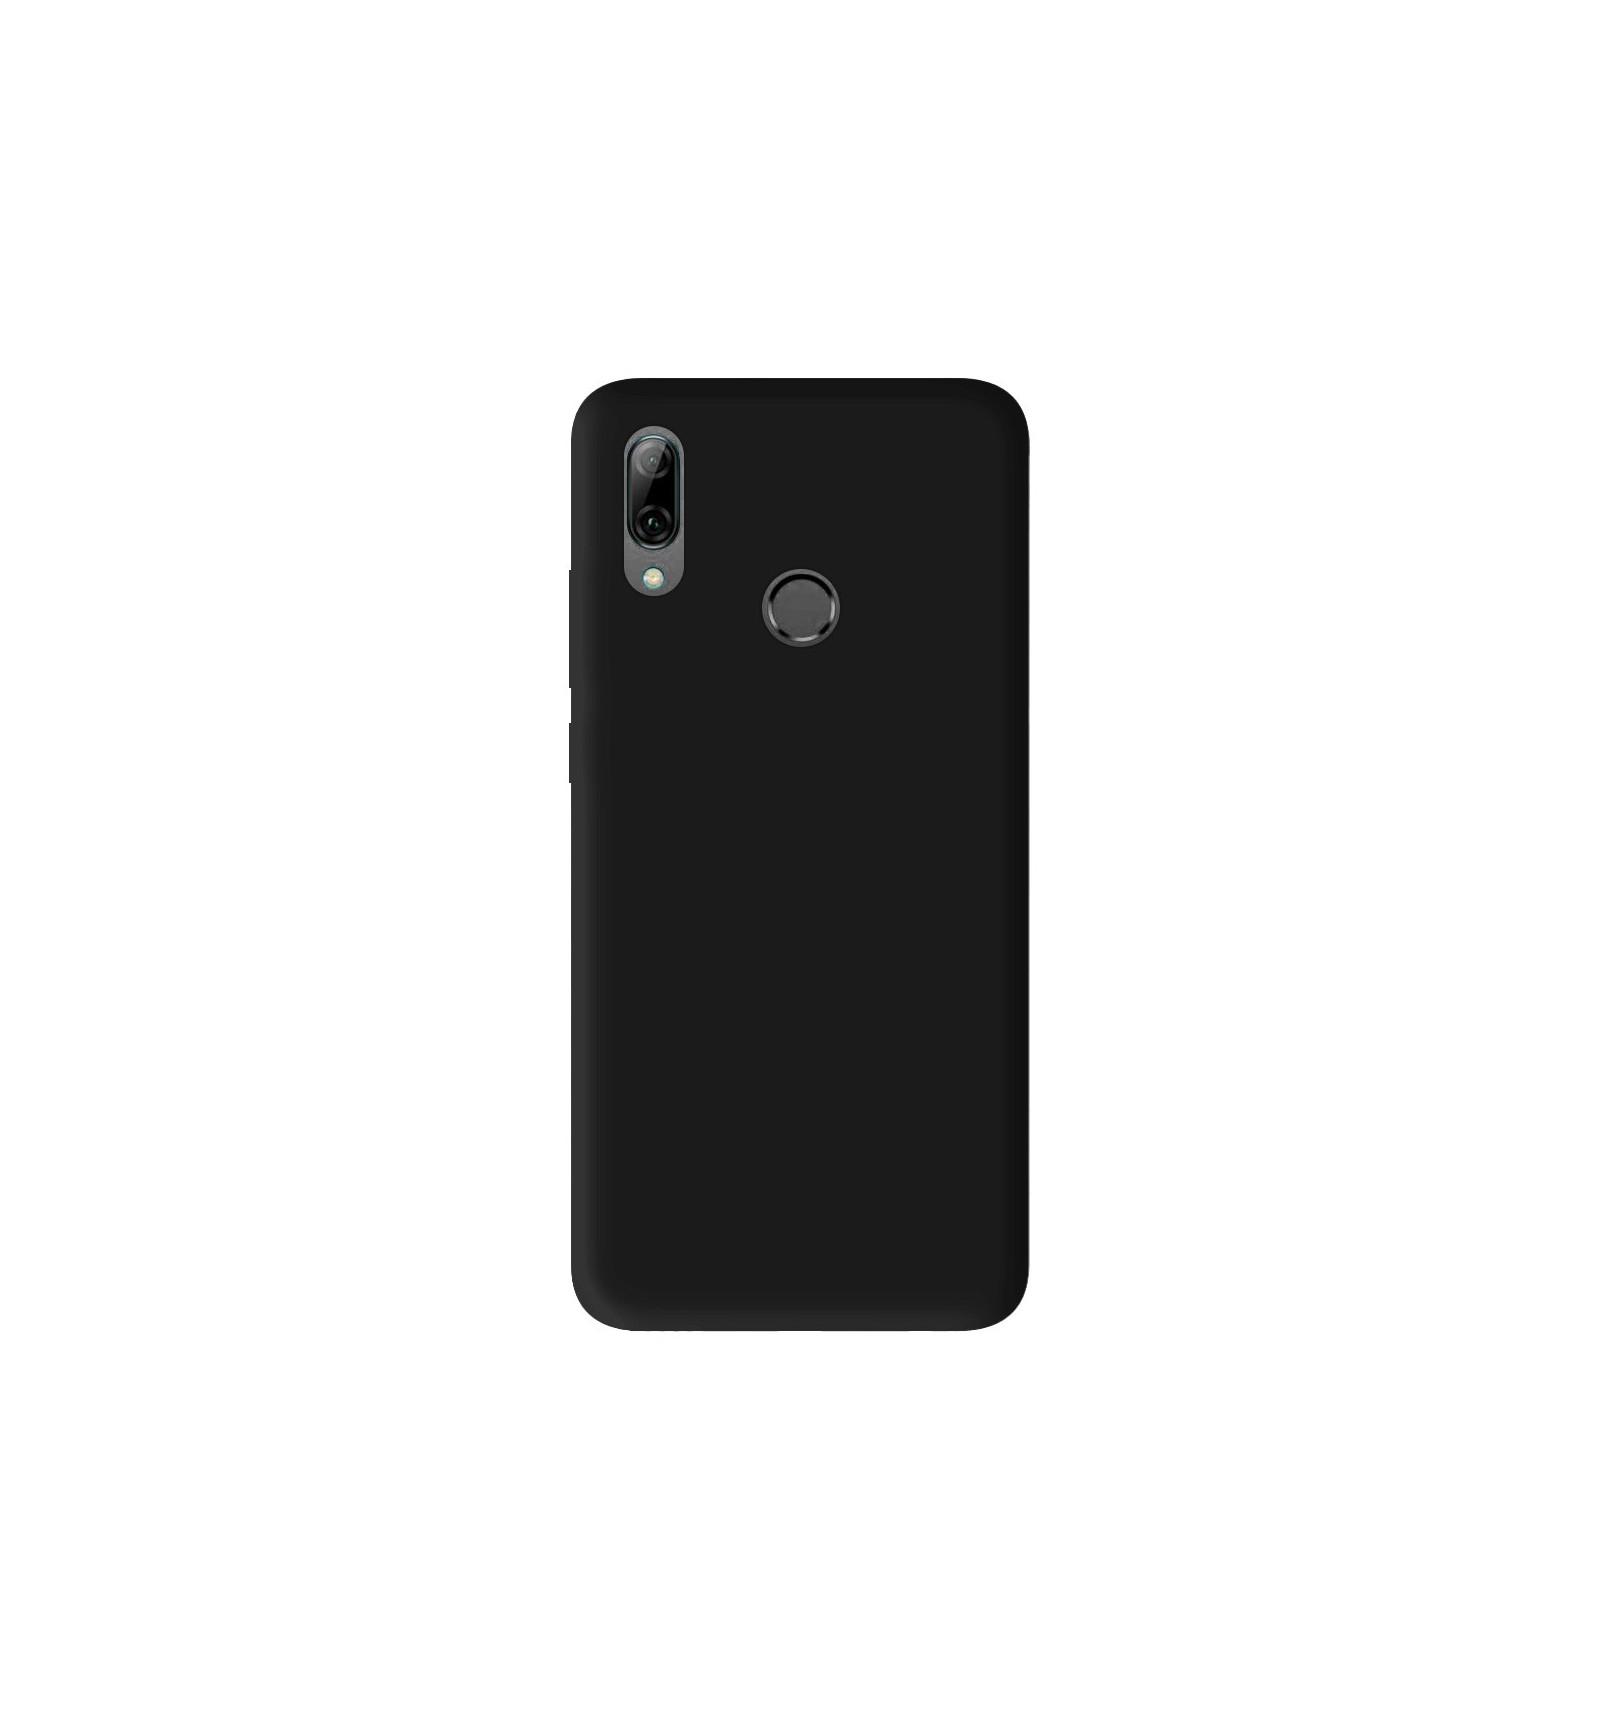 Coque Huawei P Smart 2019 Silicone Gel mat - Noir Mat